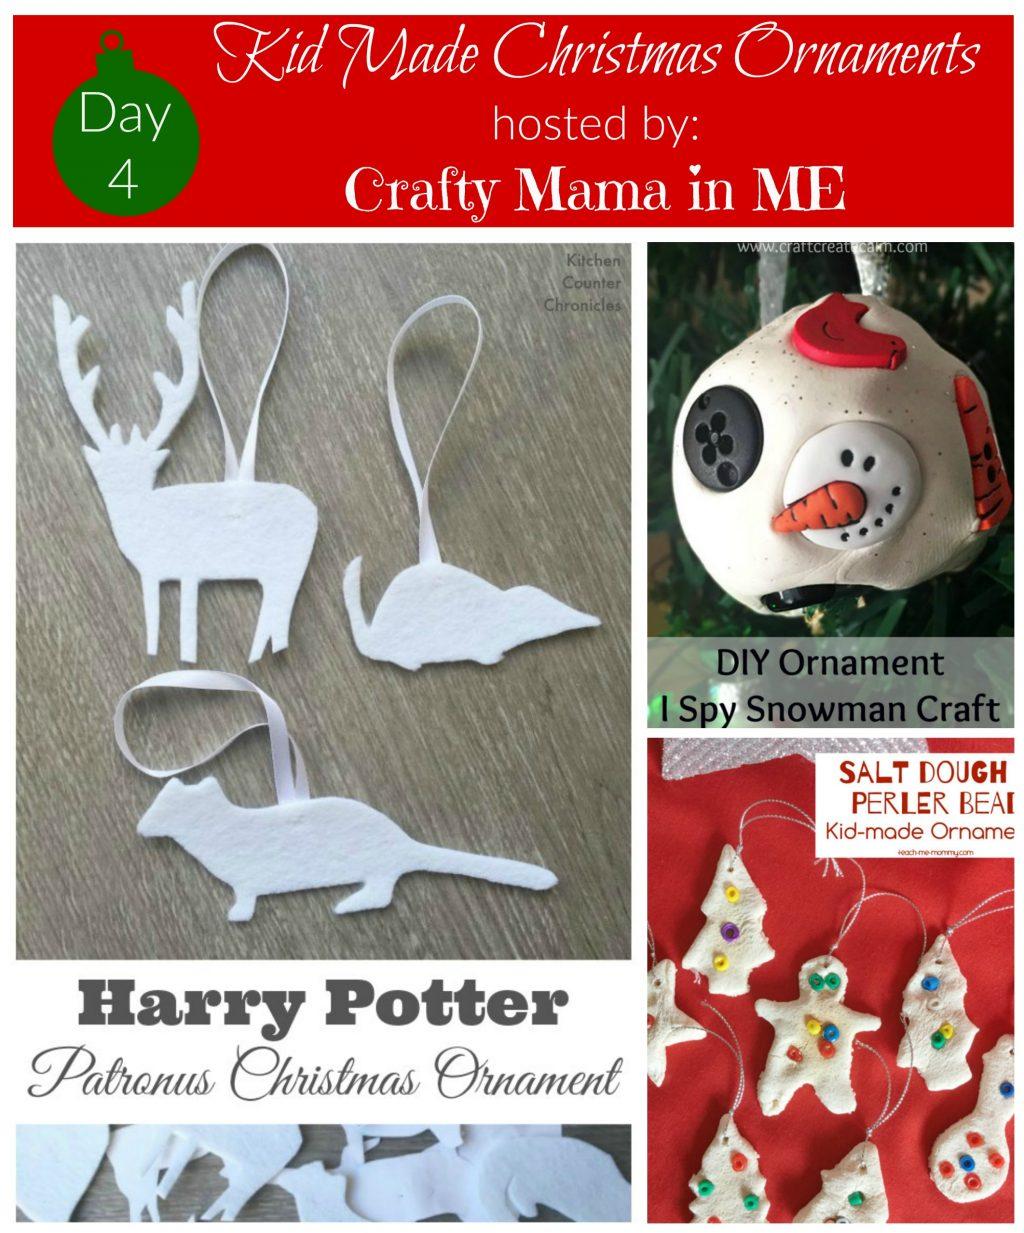 Day 4 - Kid Made Christmas Ornaments Blog Hop